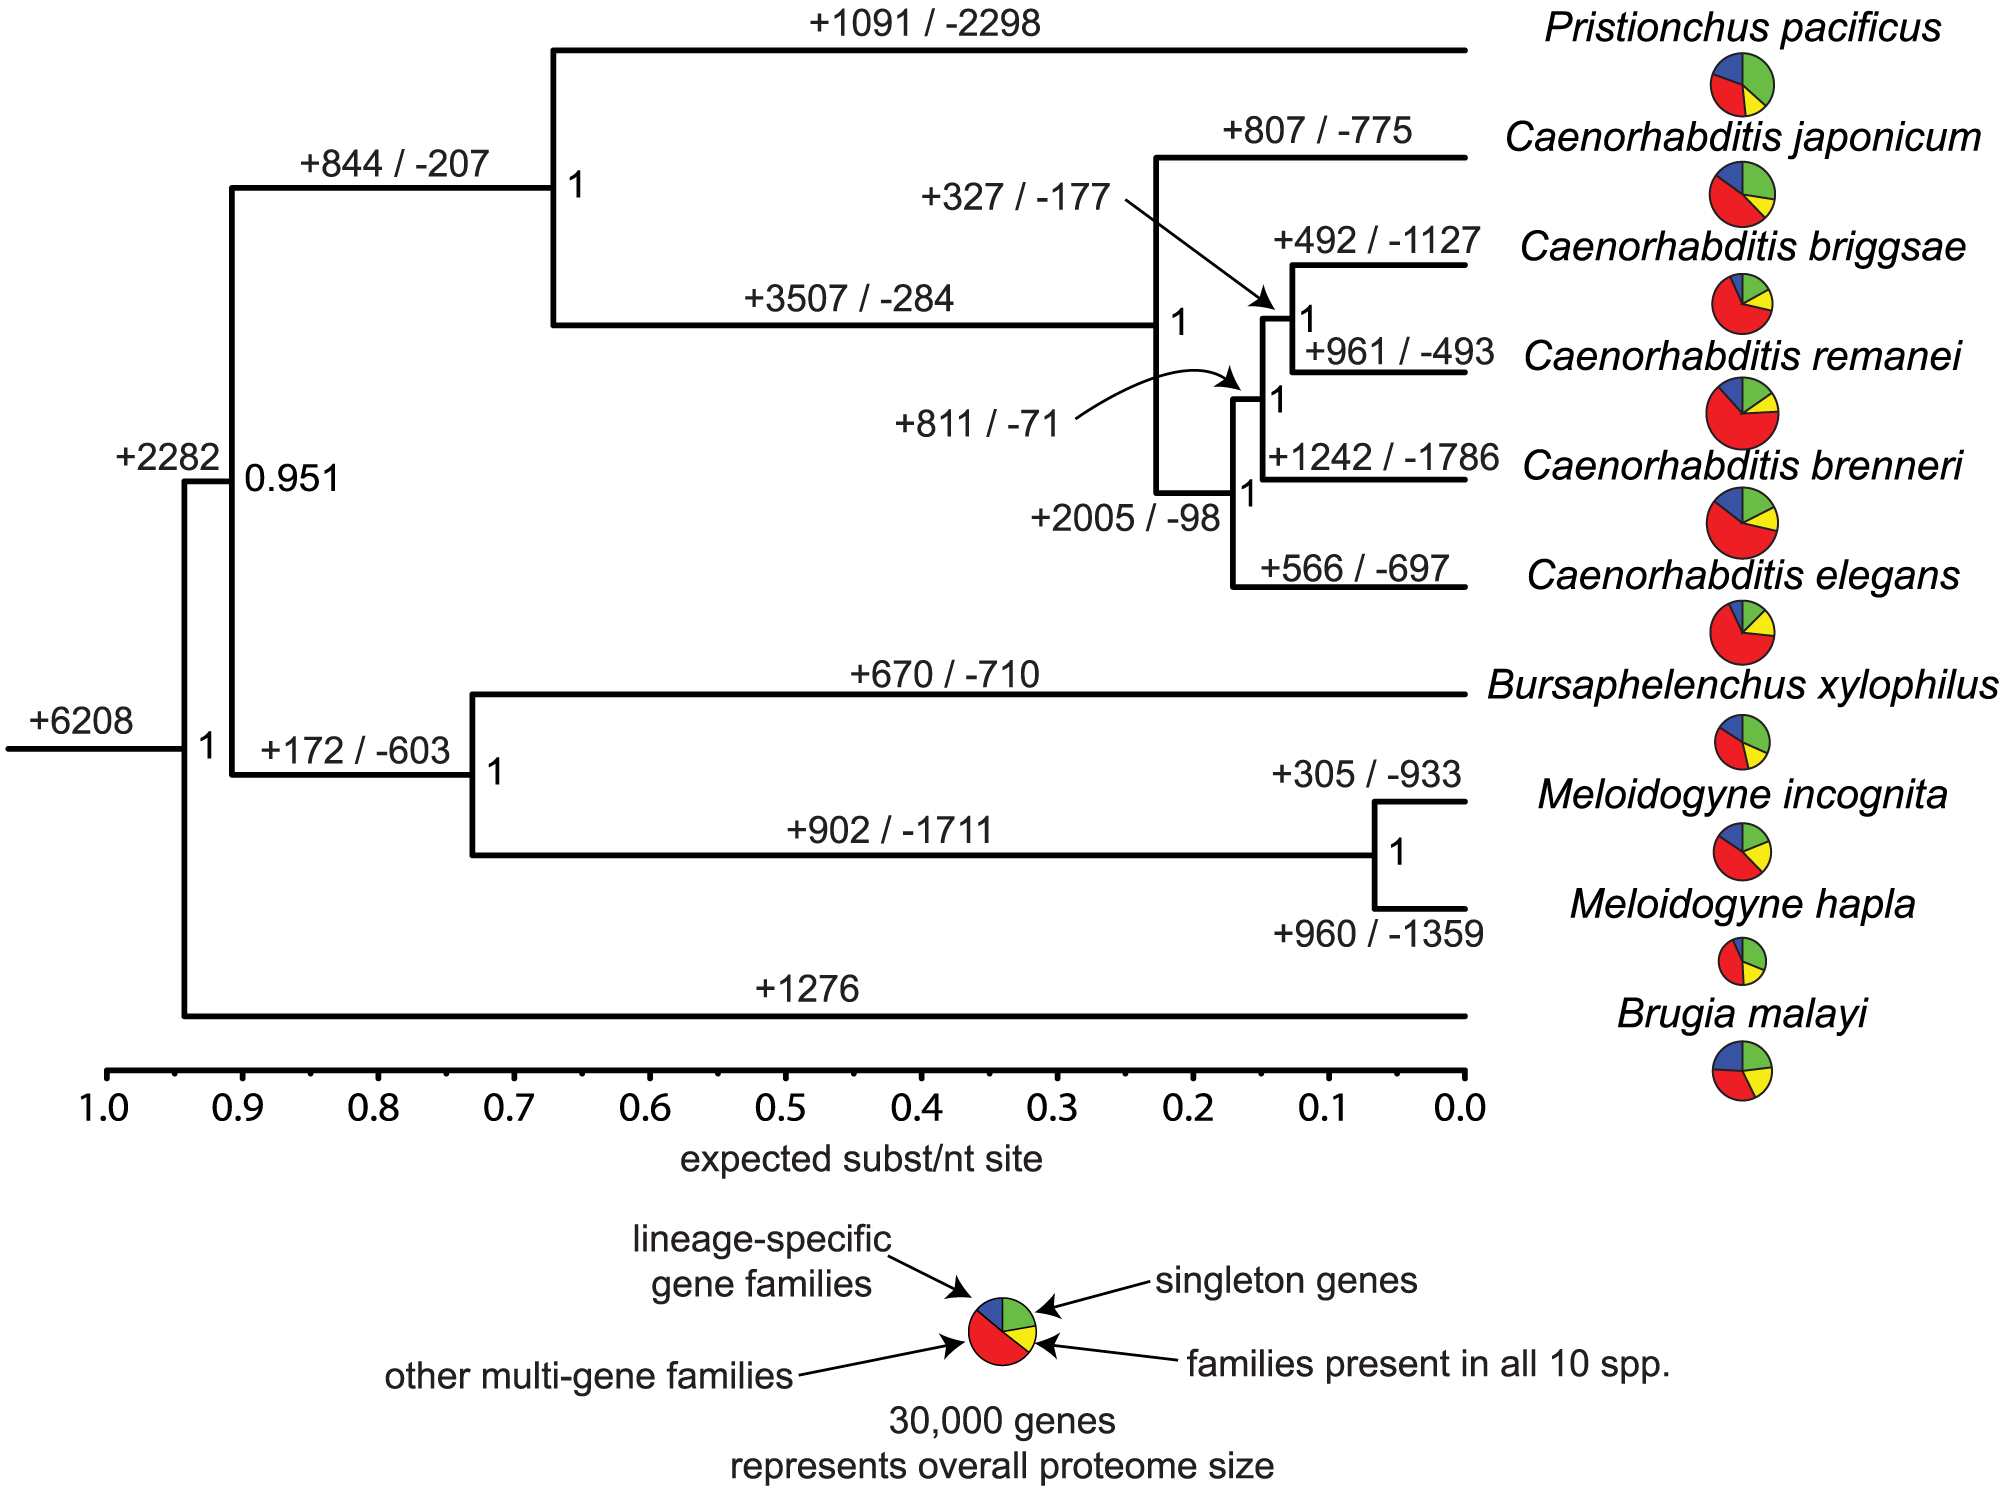 Evolutionary dynamics of gene families in nematodes.